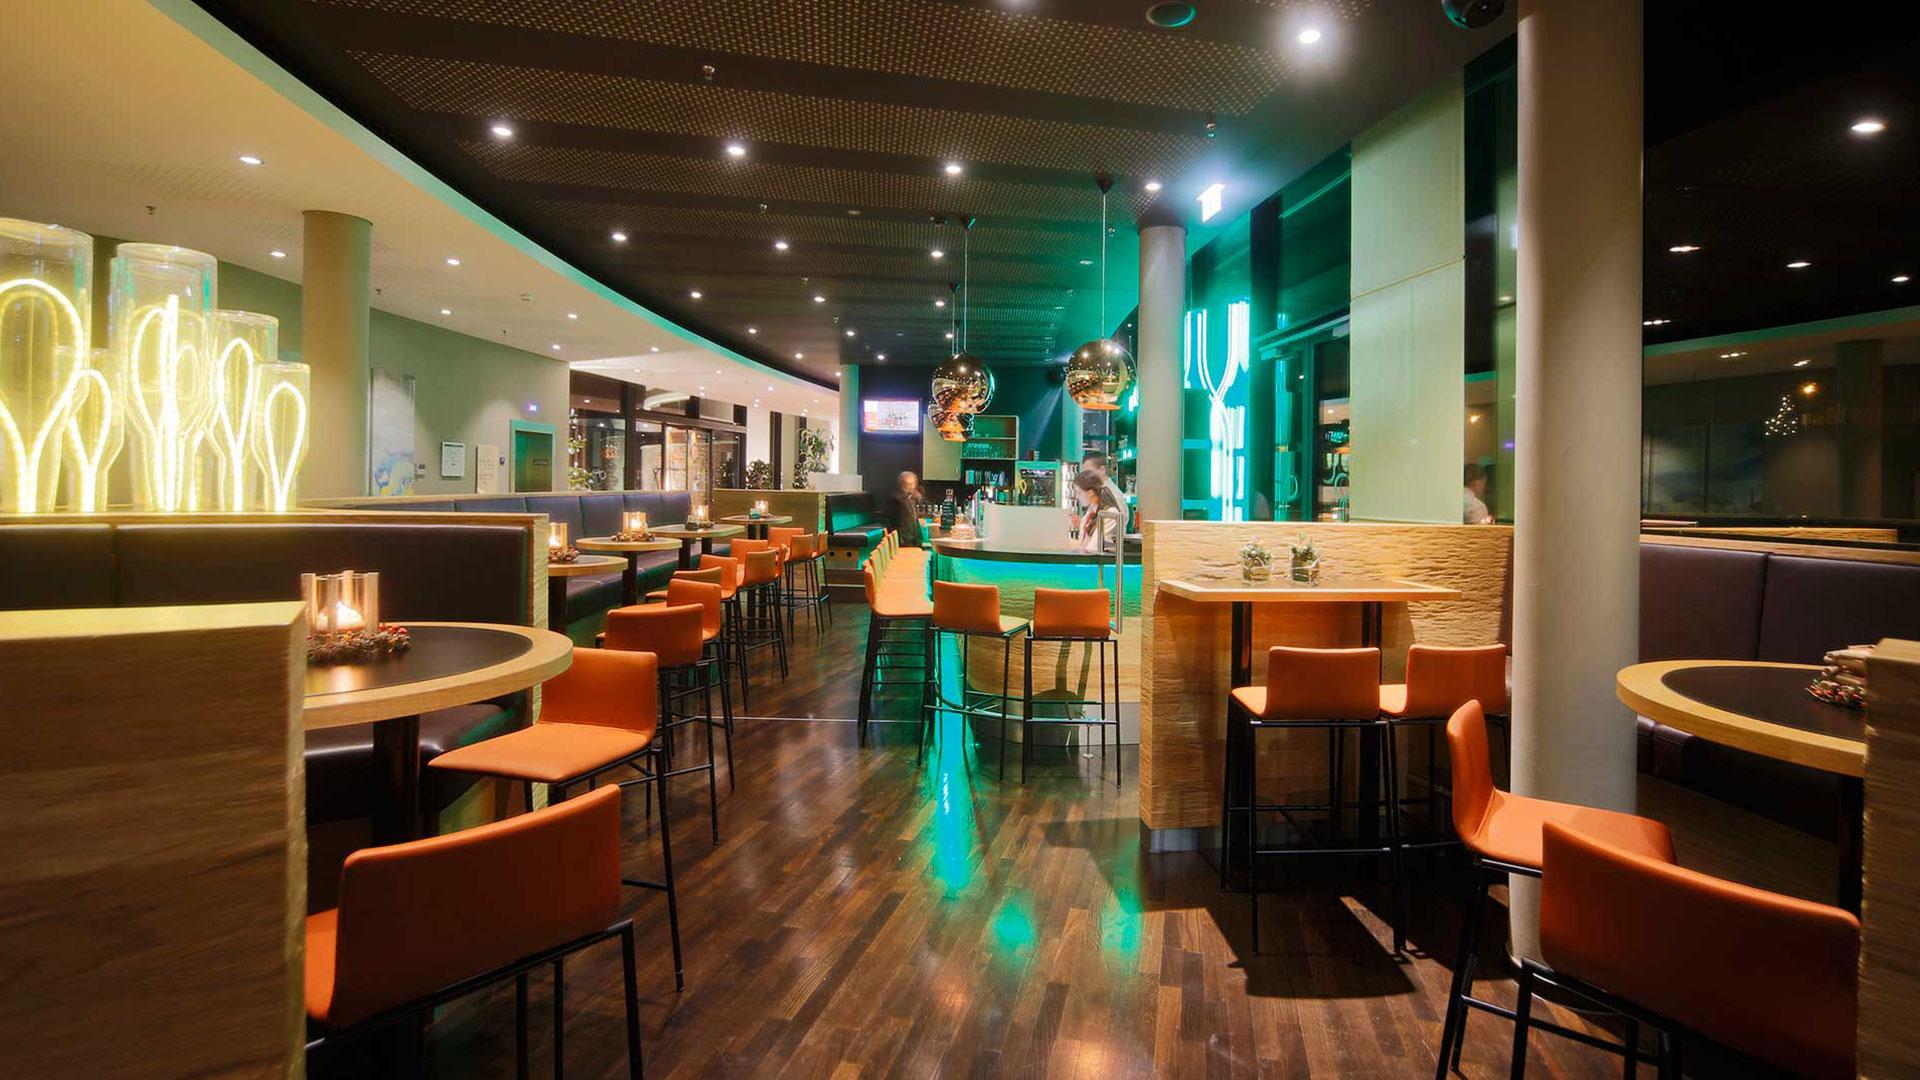 Foto vom Restaurant - 02 - Hanse Hotel Attendorn